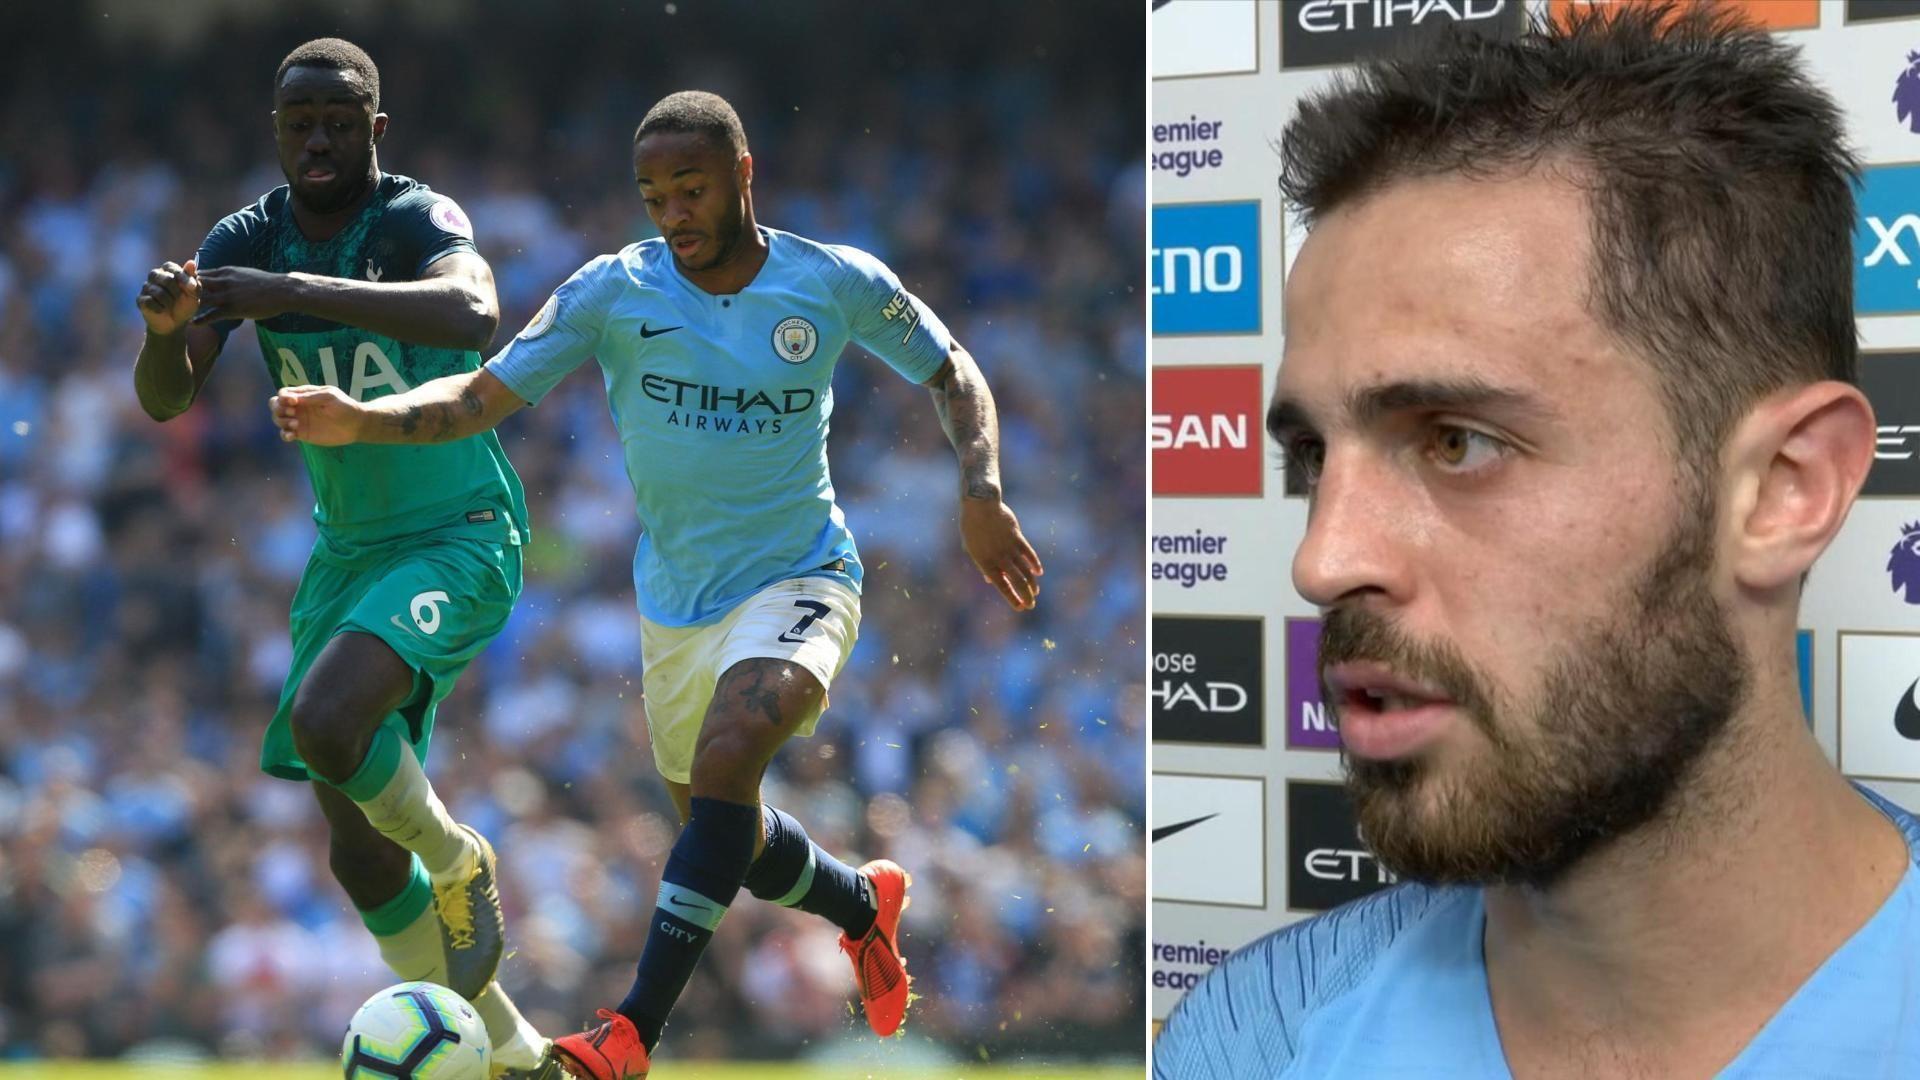 Bernardo Silva: Man City need 4 more wins